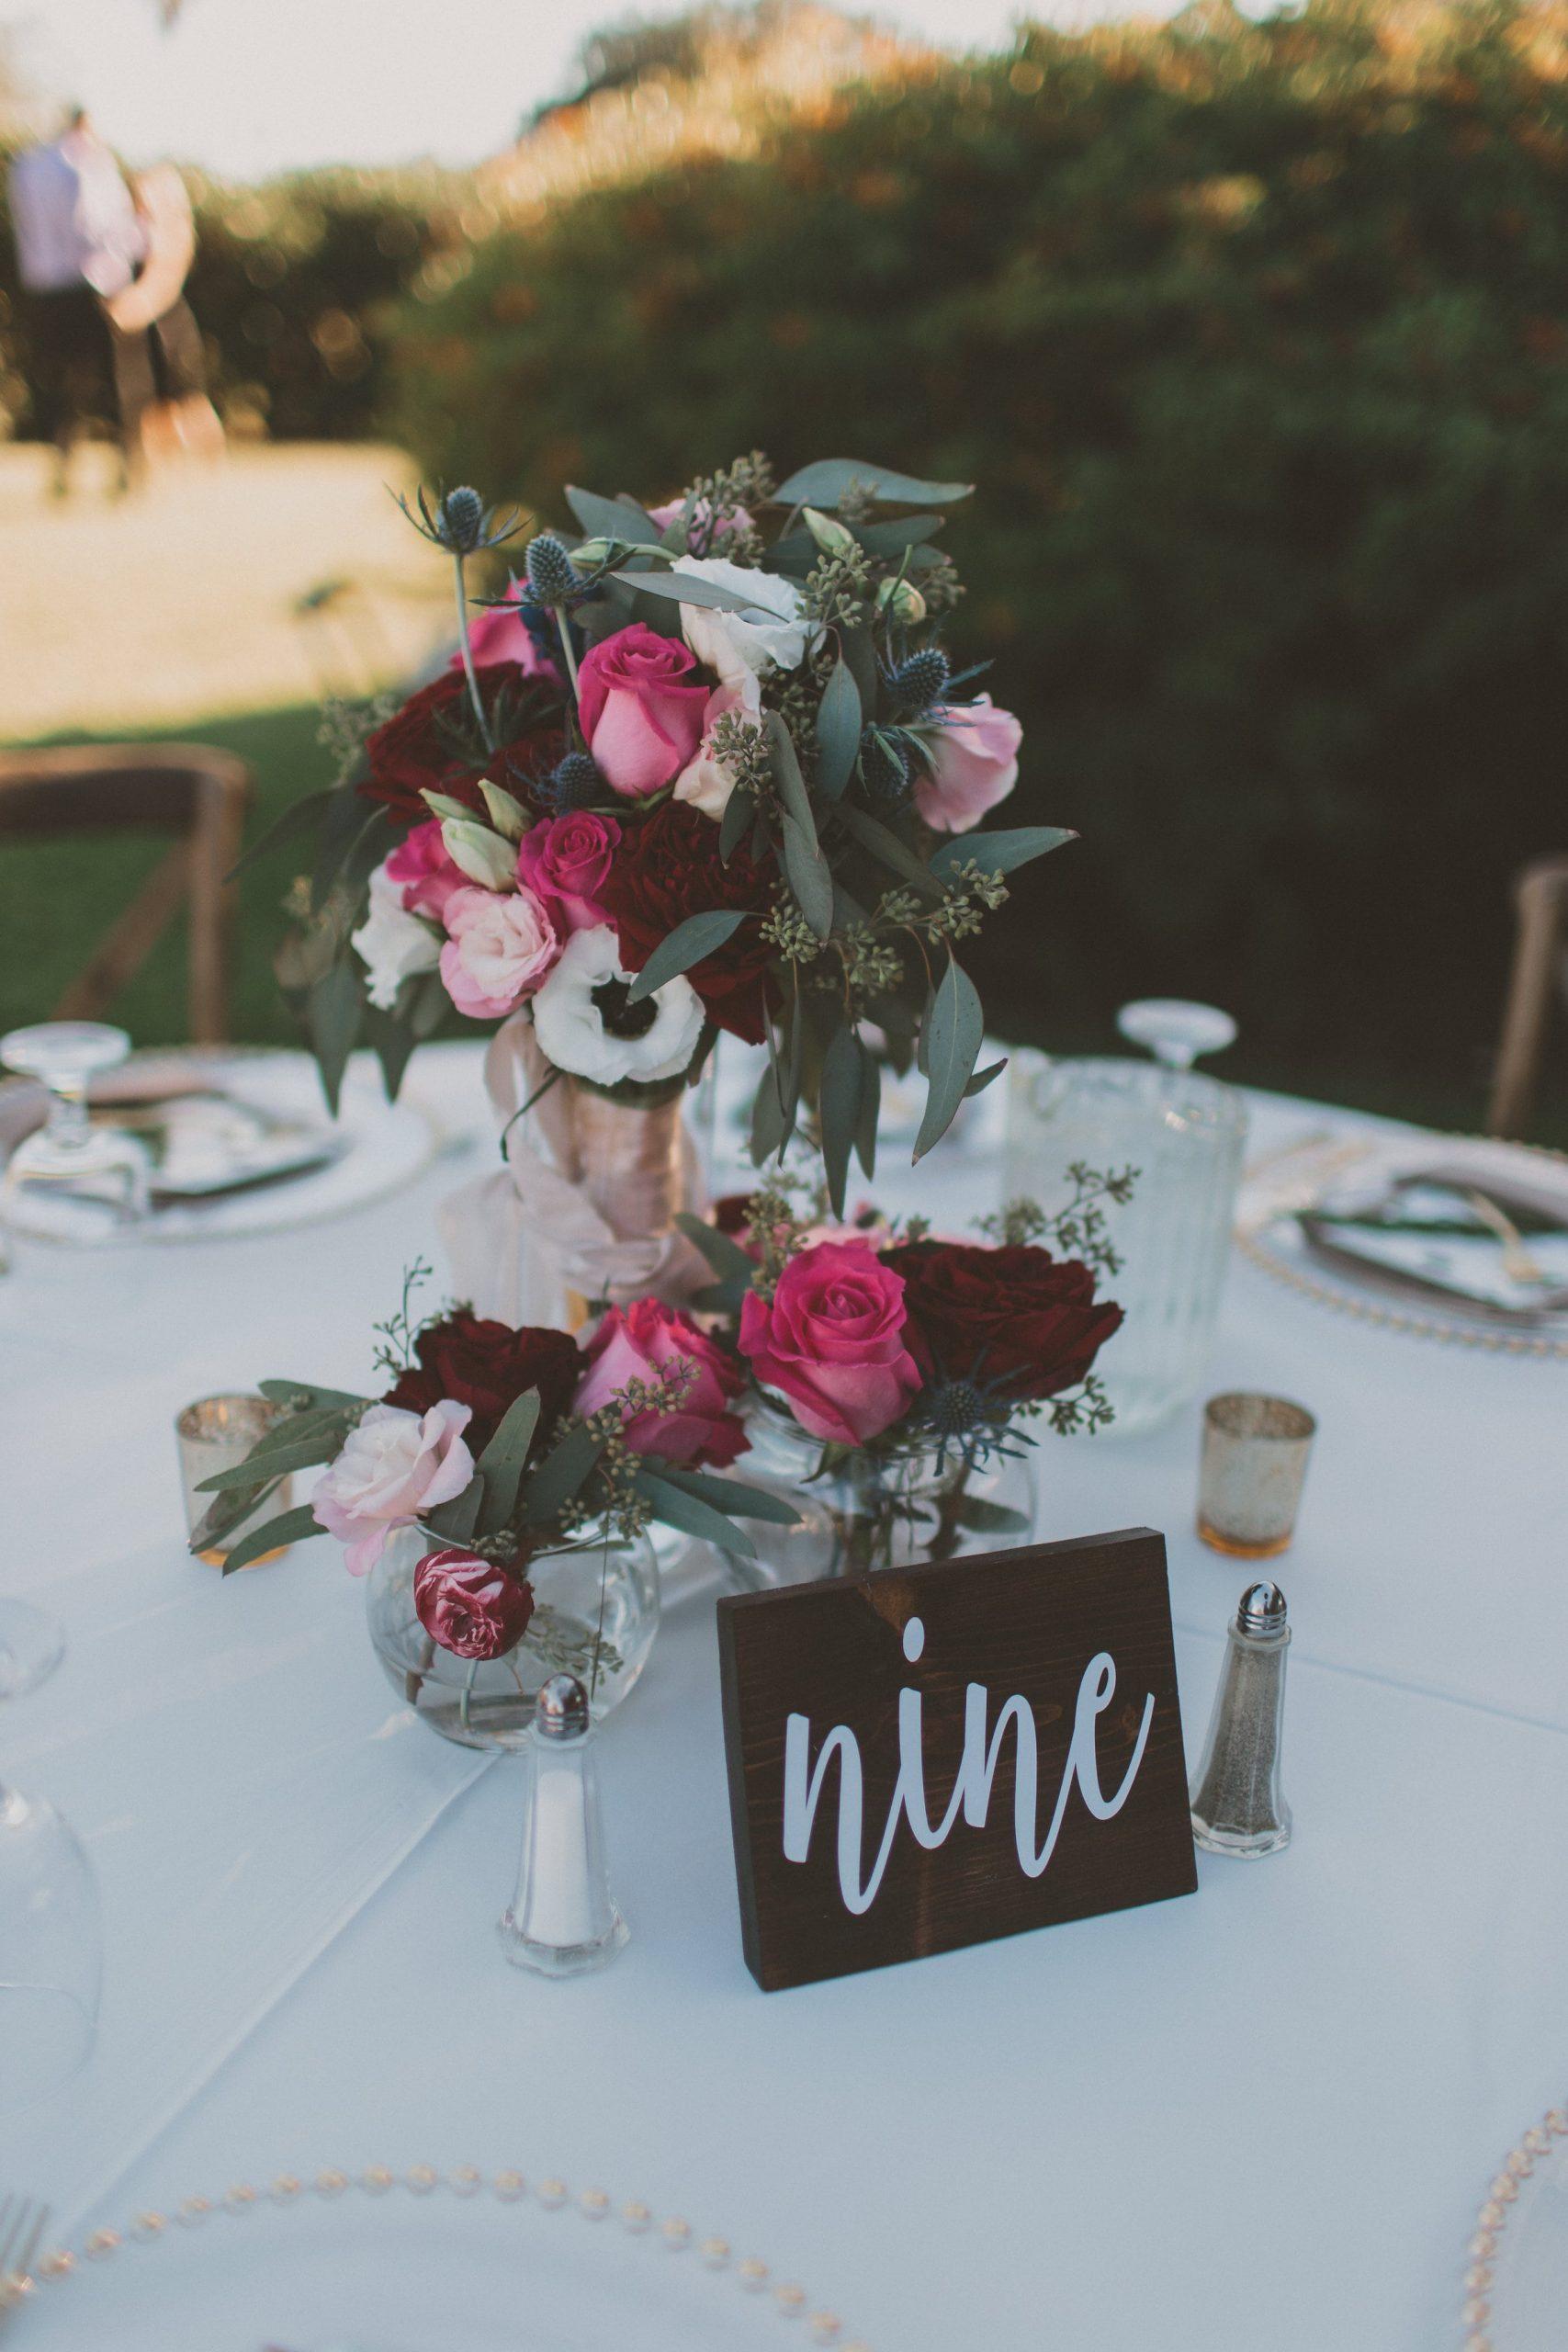 Tampa Wedding, Outdoor Wedding, Tampa Floral, Davis Island Garden Club, Tampa Event, Tampa Decor